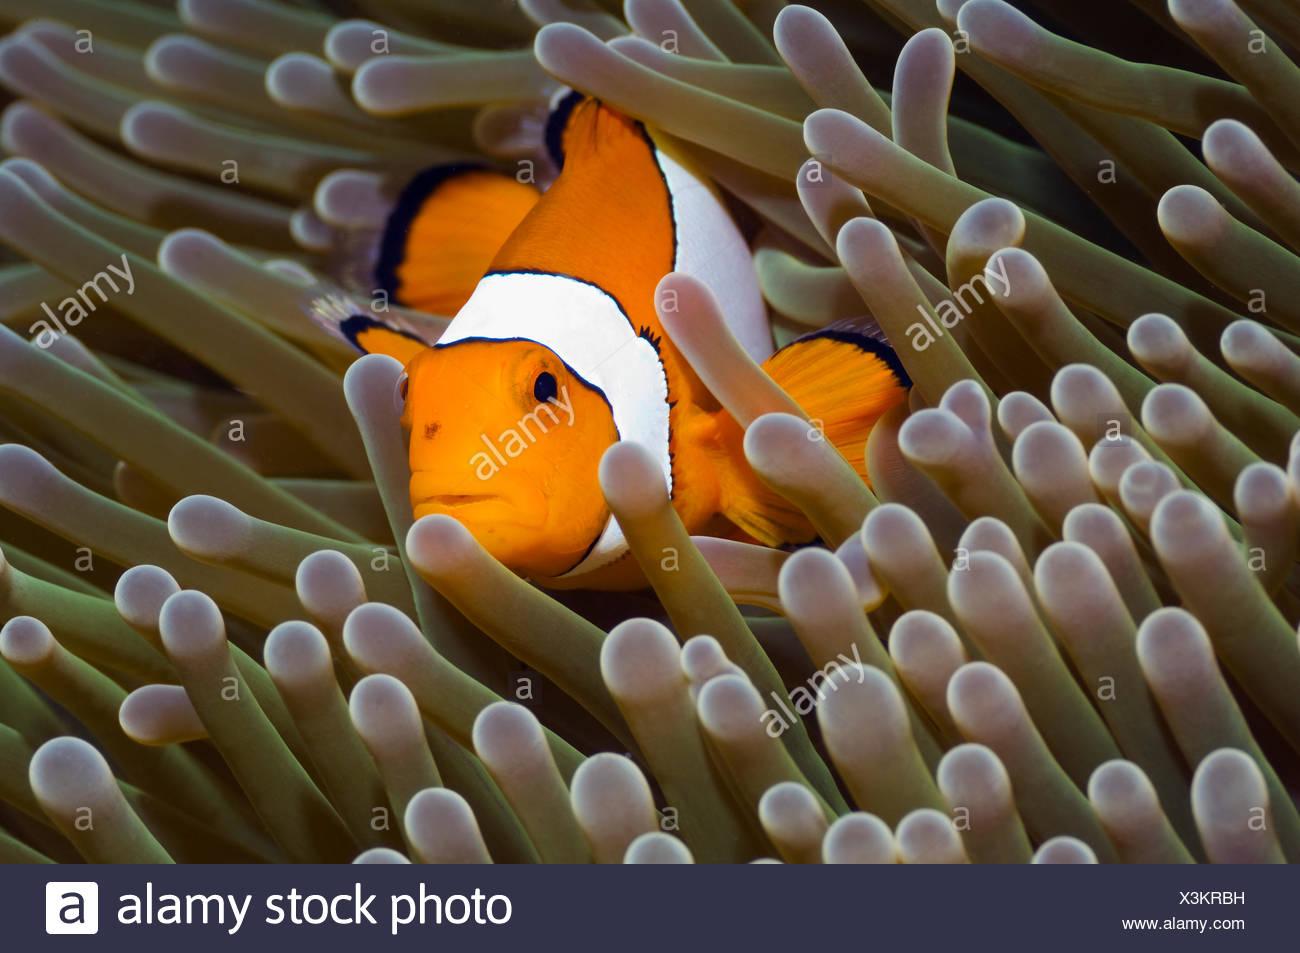 Falscher Clown Anemonenfische (Amphiprion Ocellaris) unter Anemone Tentakeln, Misool, Raja Ampat, West Papua, Indonesien. Stockbild